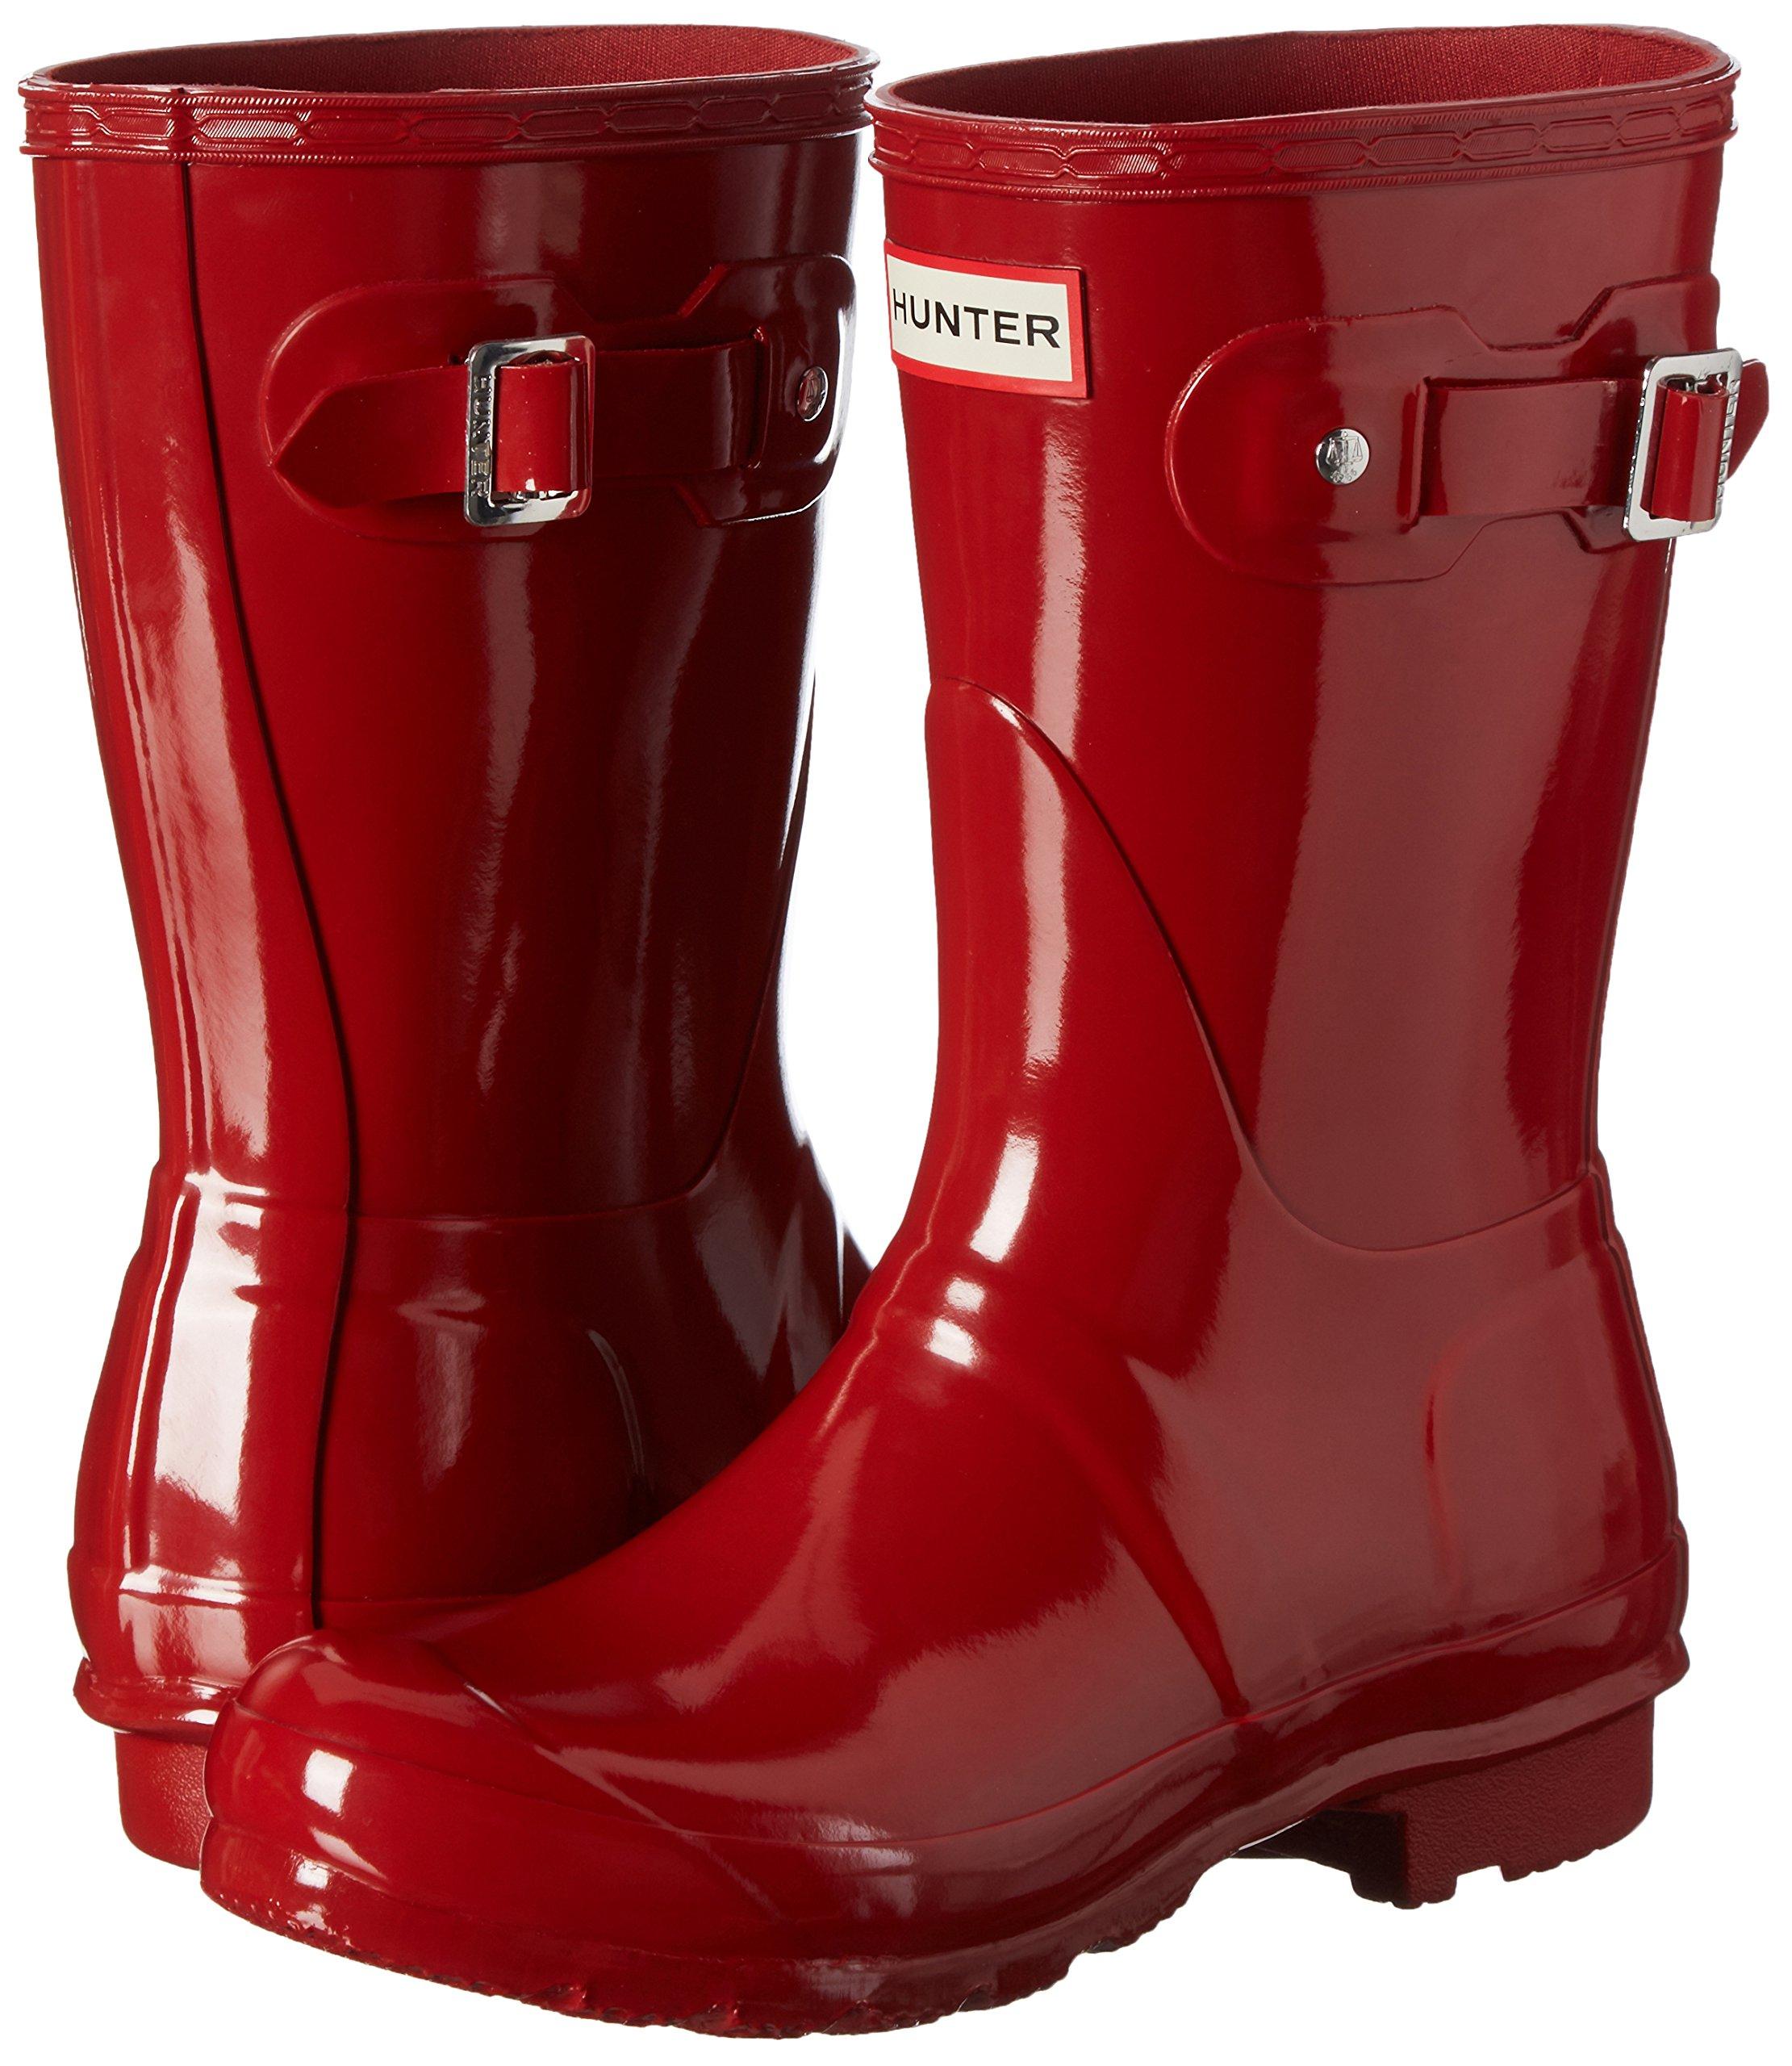 Hunter-WFS1000RGL-Women-039-s-Original-Short-Gloss-Boots-All-Colors thumbnail 29